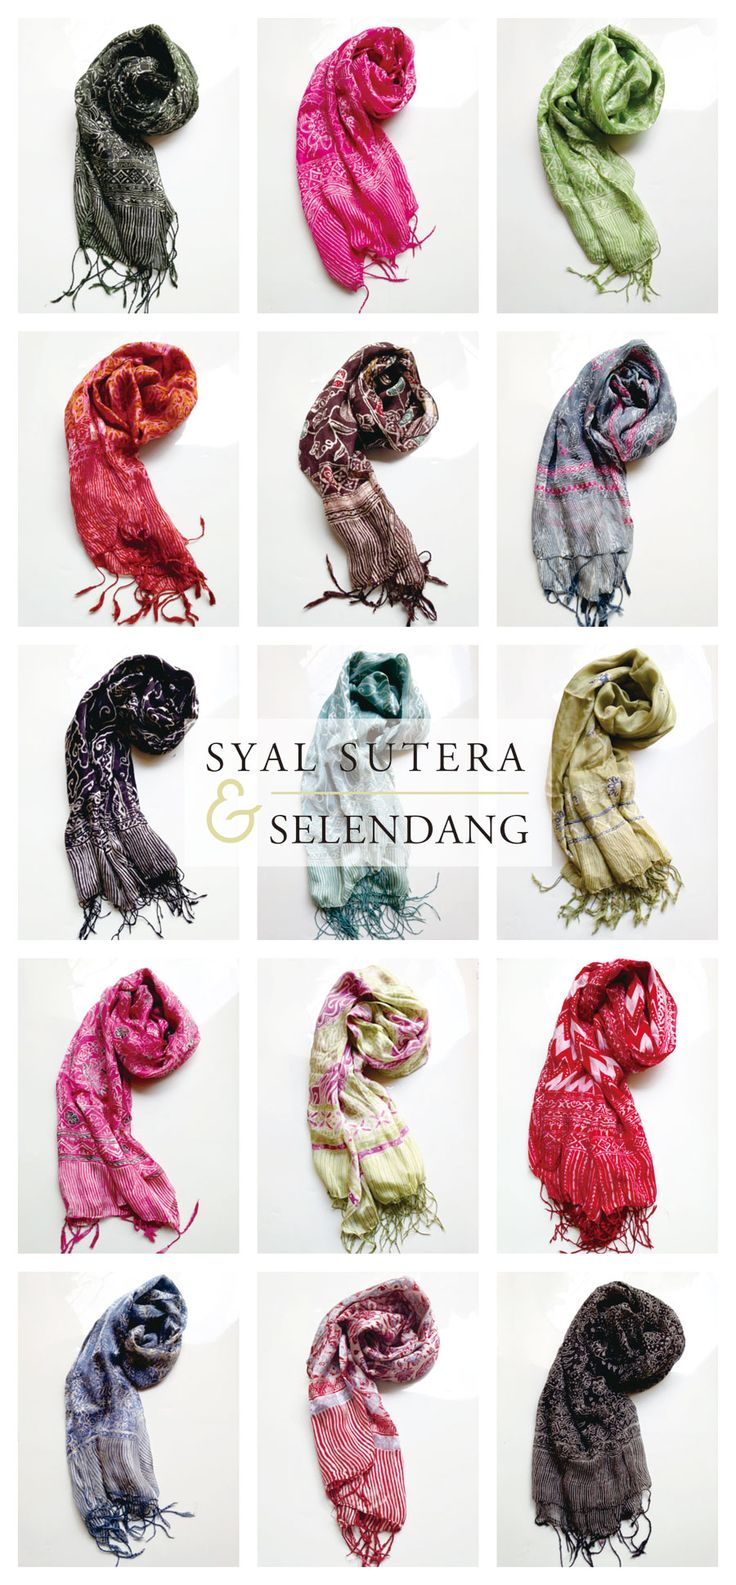 #selendang #shawl #syal #sutera #silk #indonesia #batiks | only on http://thebatik.co.id/syal-selendang-batik/